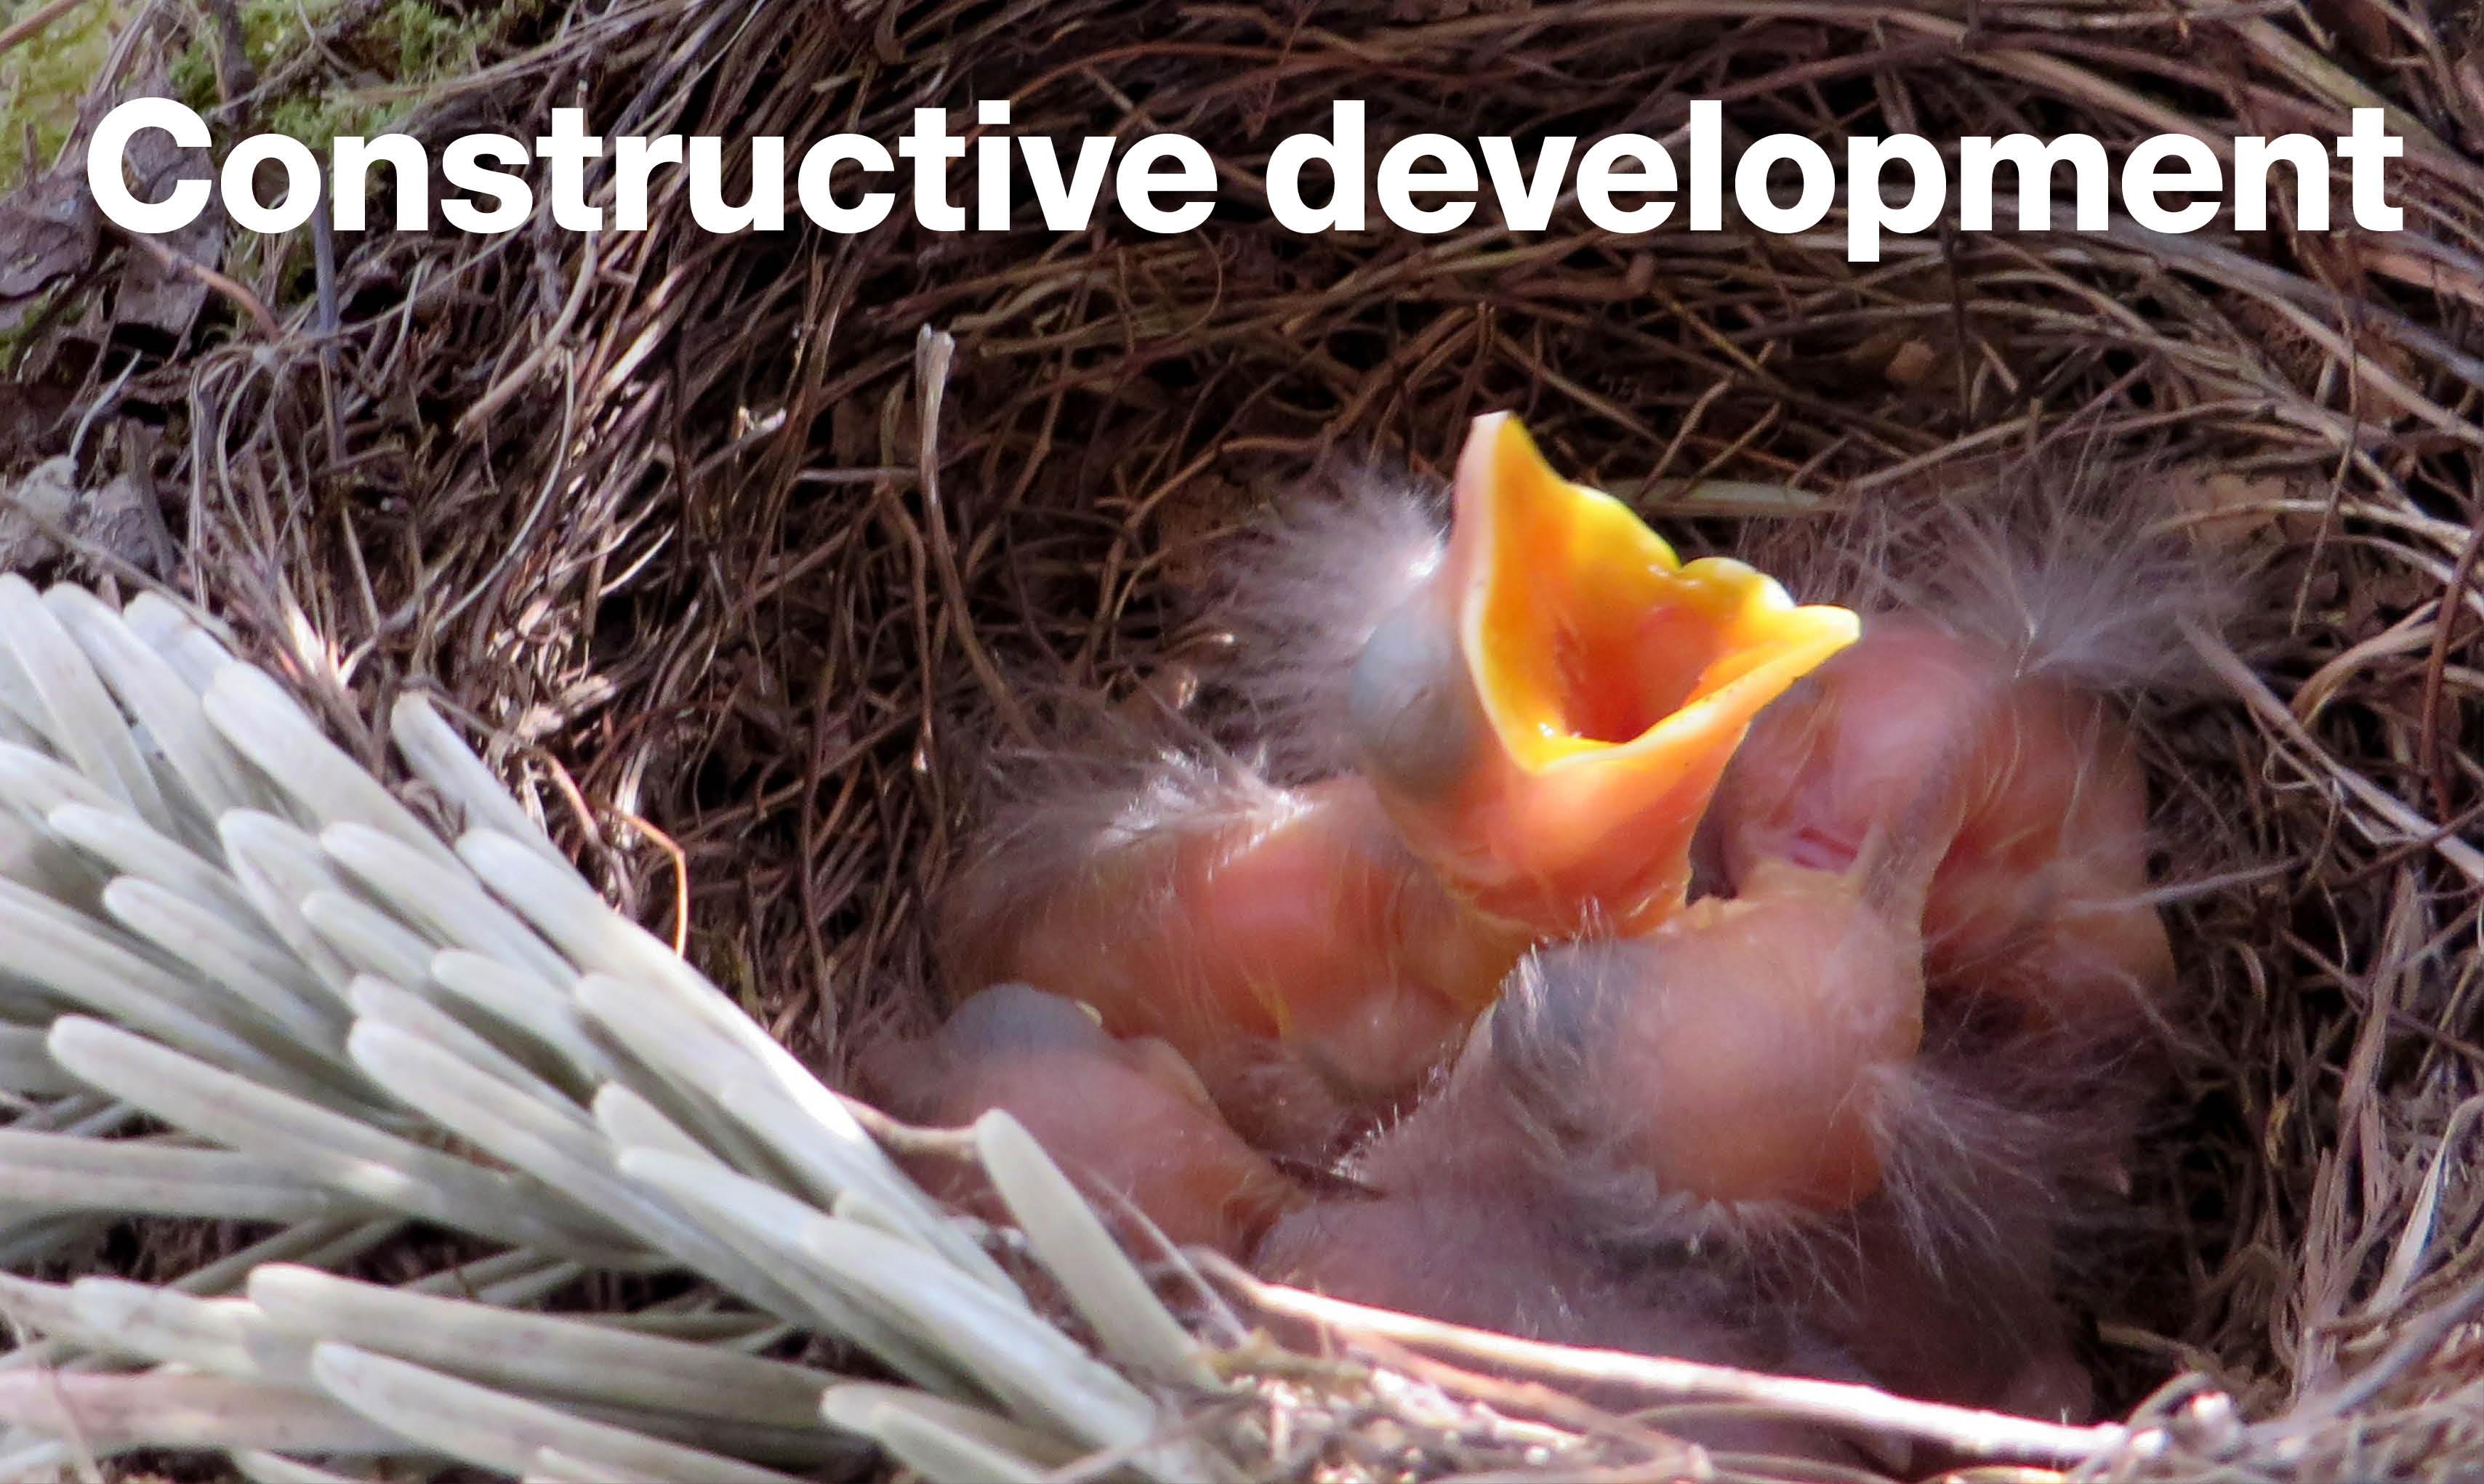 Constructive development